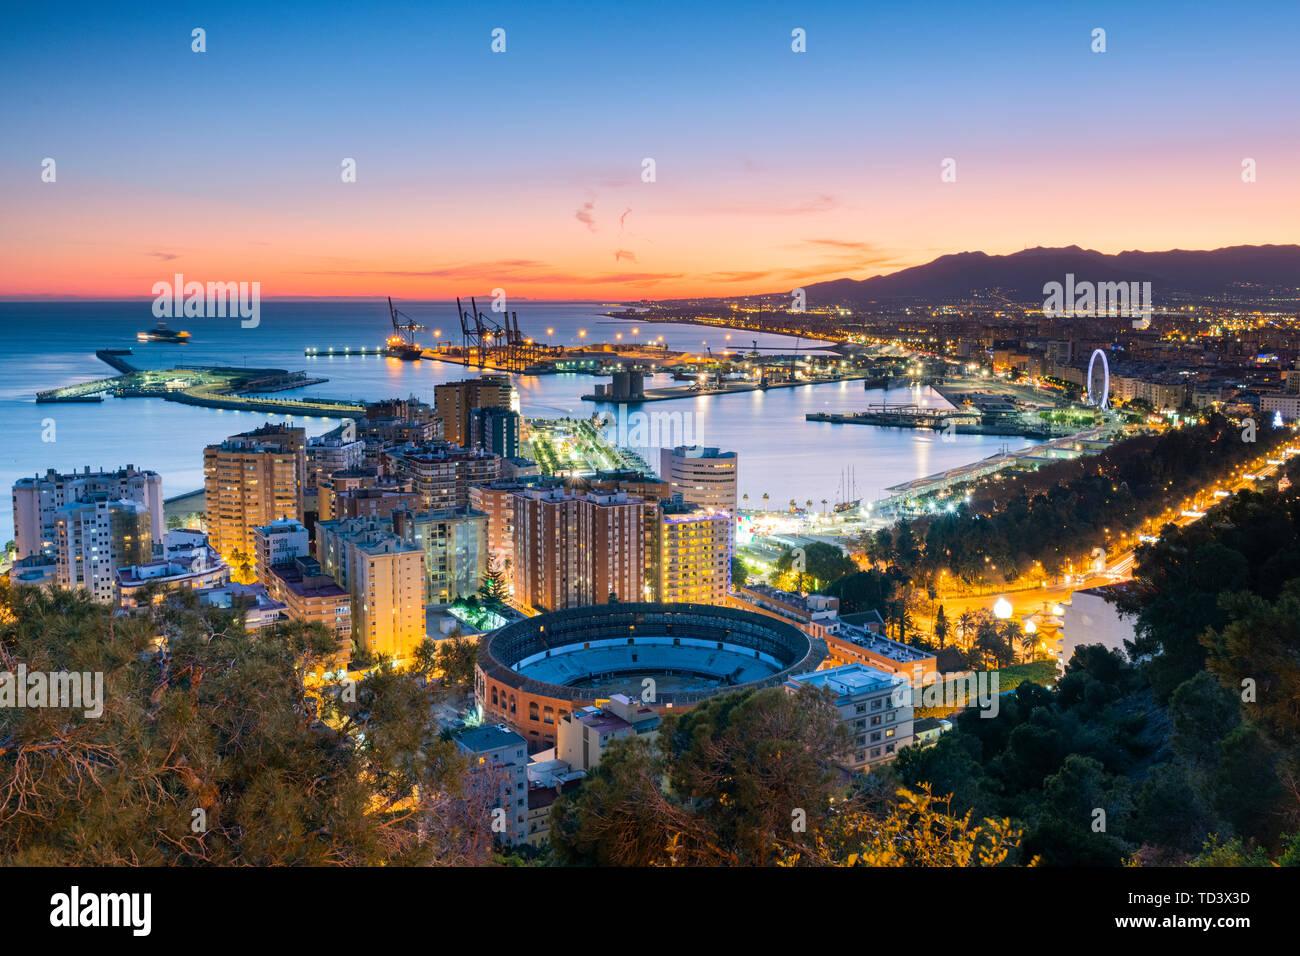 Gibralfaro Viewpoint, Malaga, Costa del Sol, Andalusien, Spanien, Europa Stockfoto